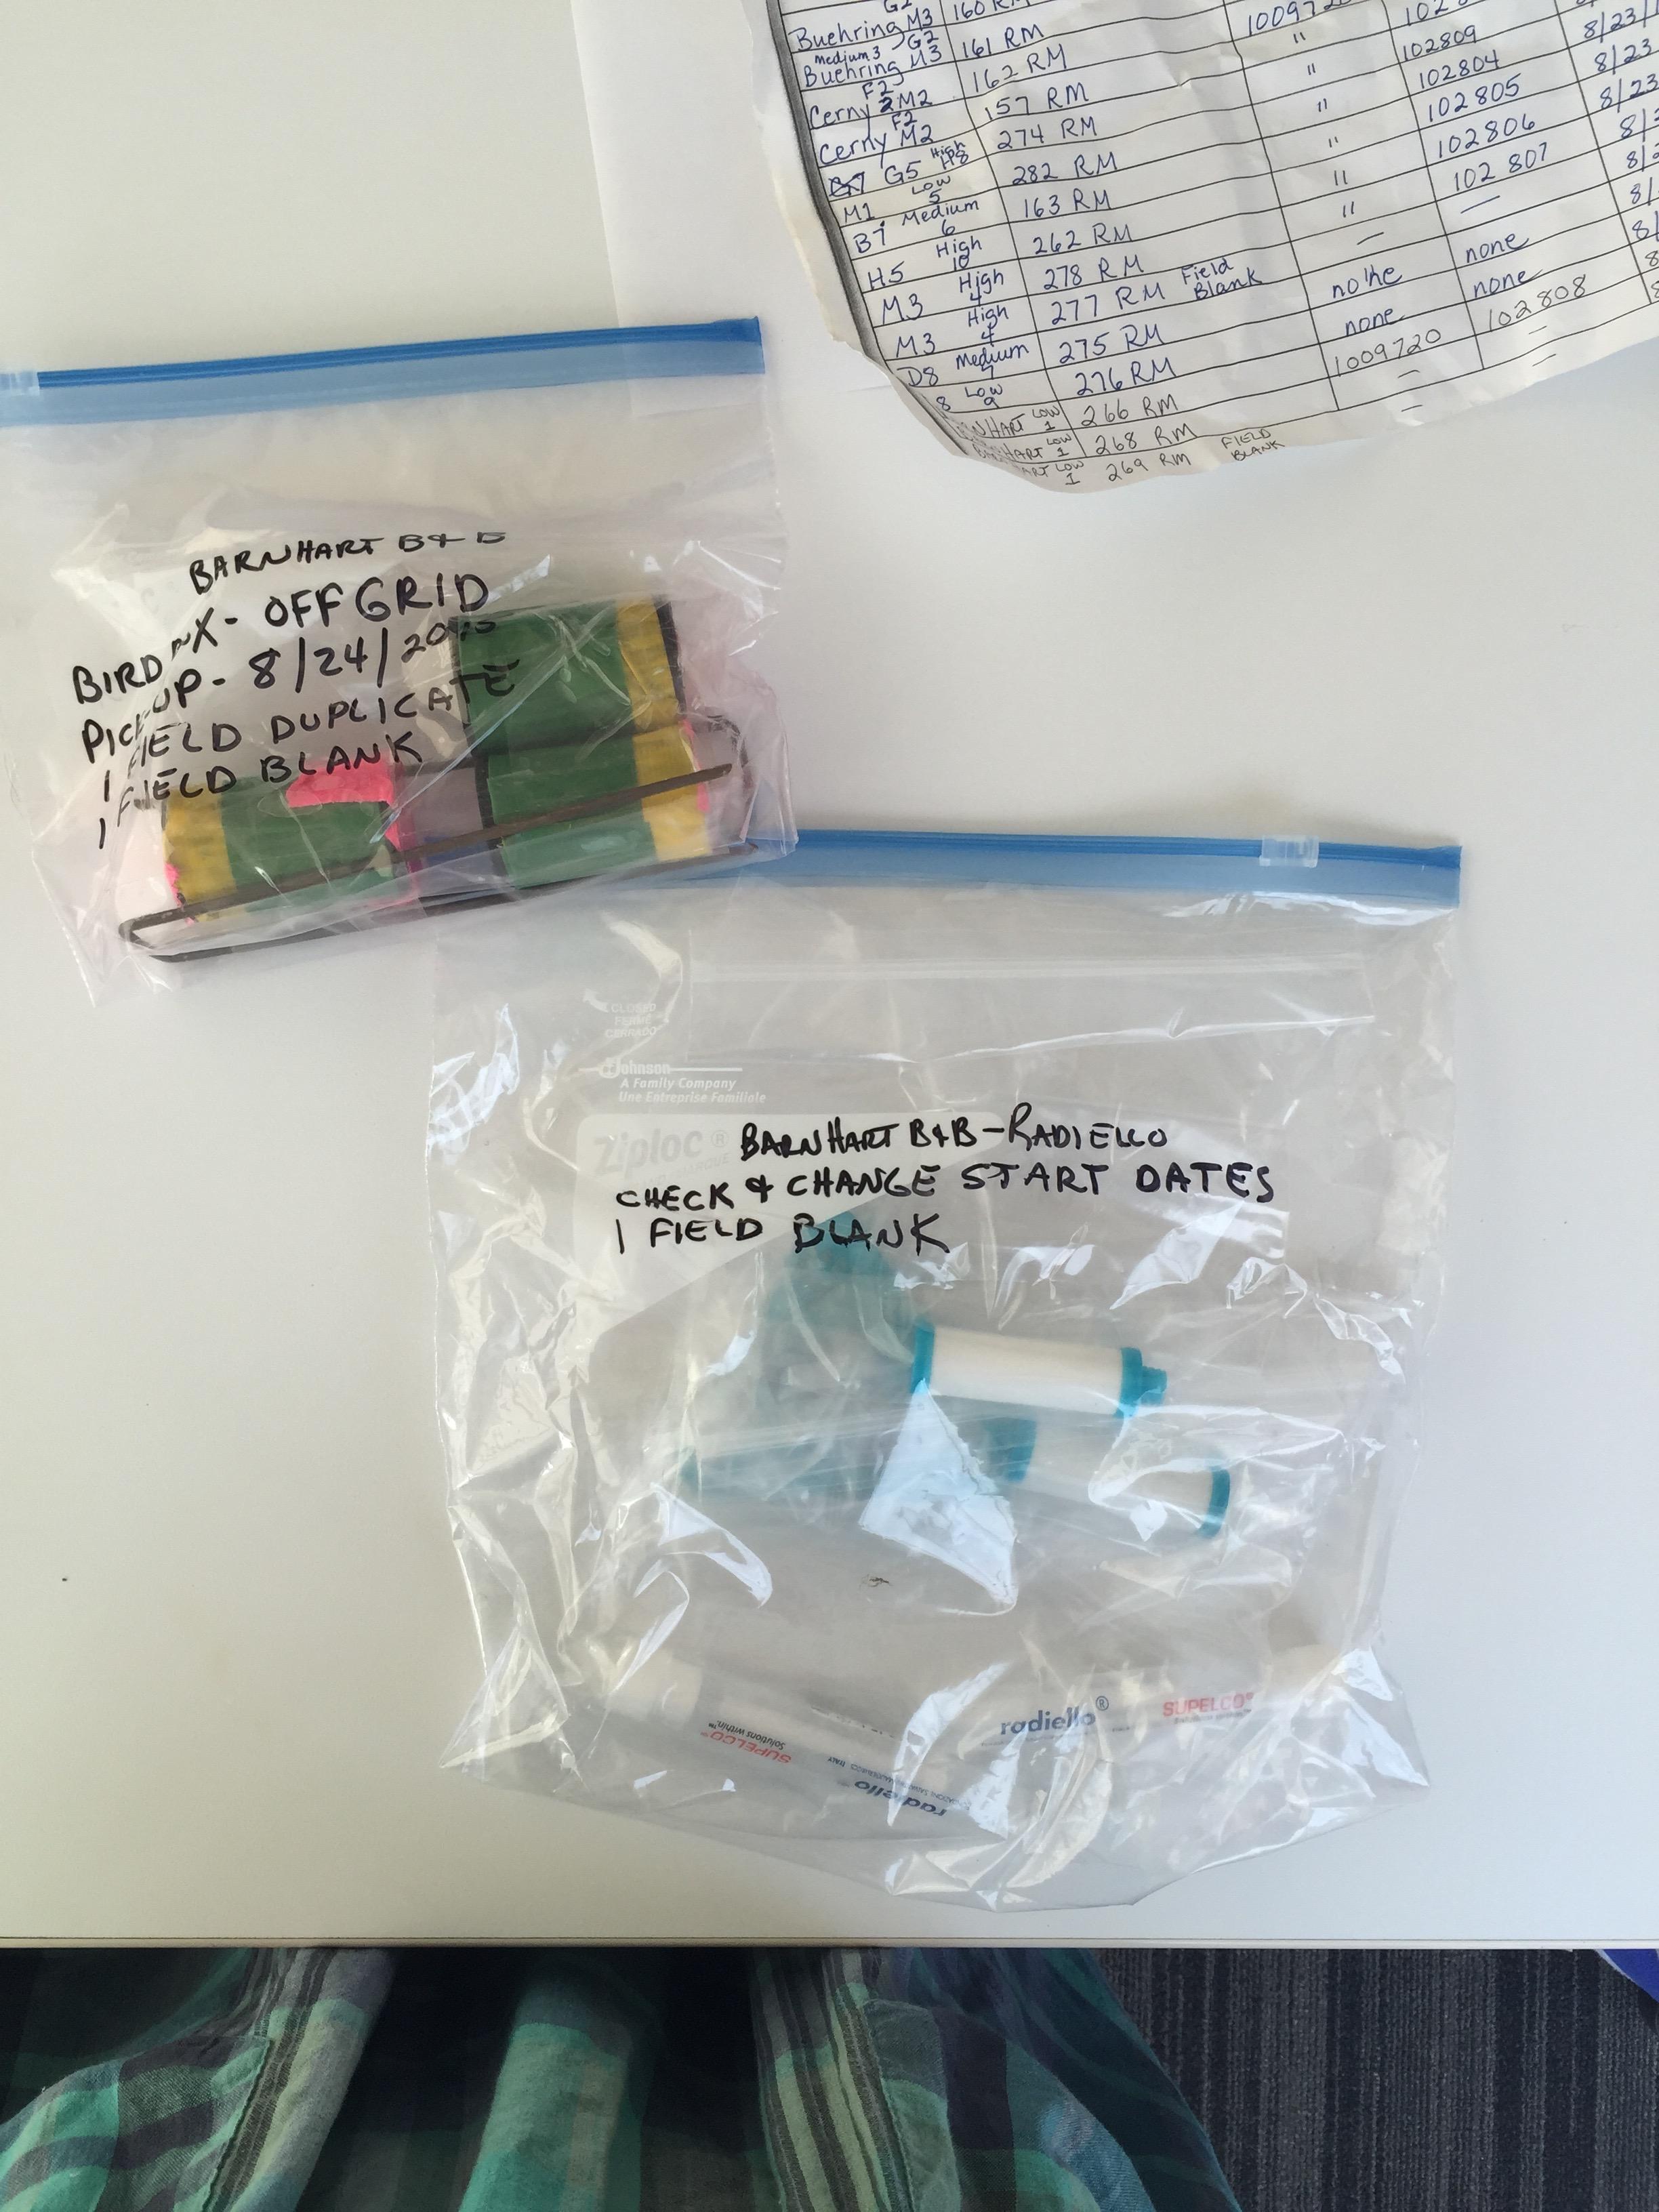 Samples before analysis